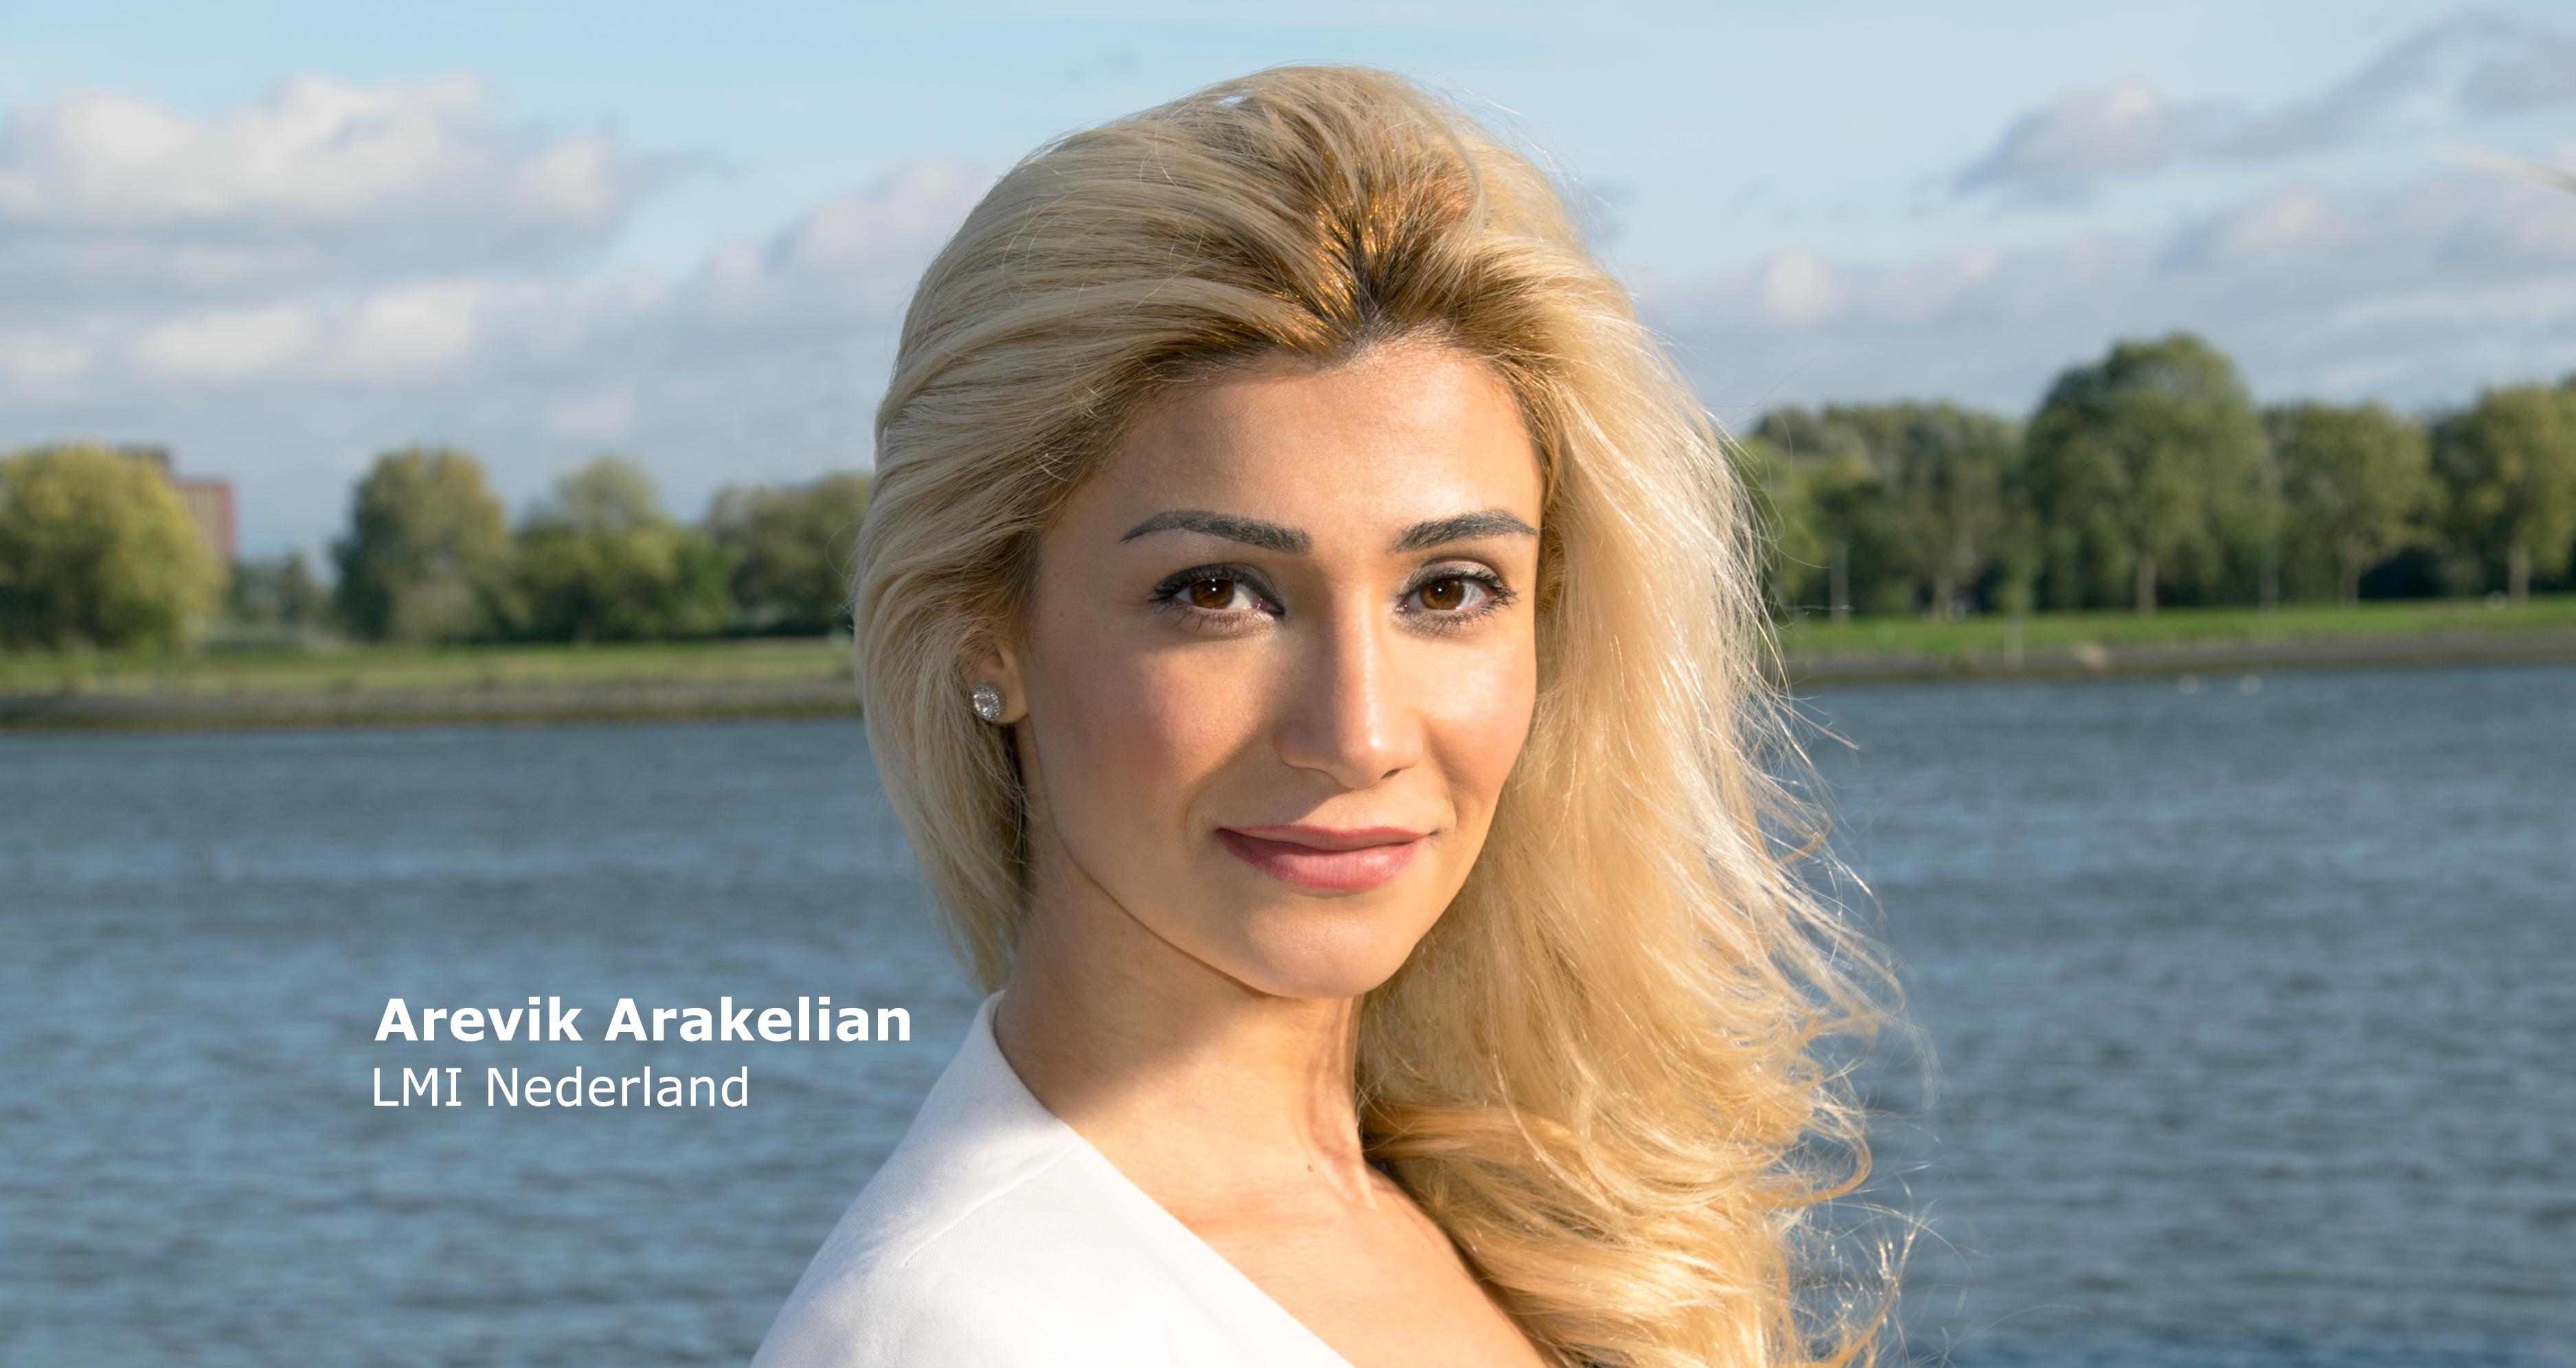 Arevik Arakelian